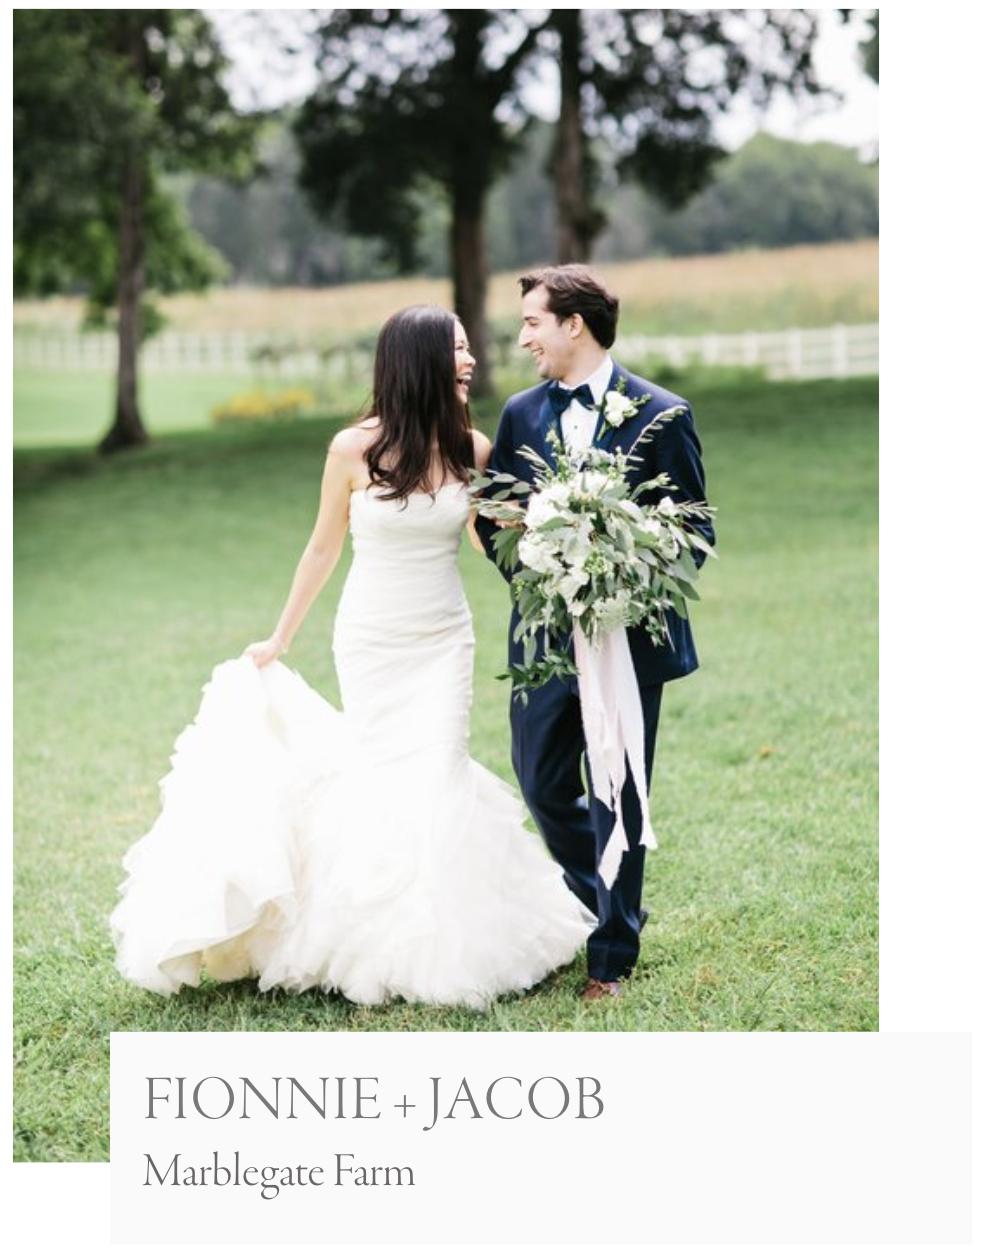 Fionnie_Jacob_Marblegate_Farm_Wedding_Knoxville_Abigail_Malone_Photography-387.jpg